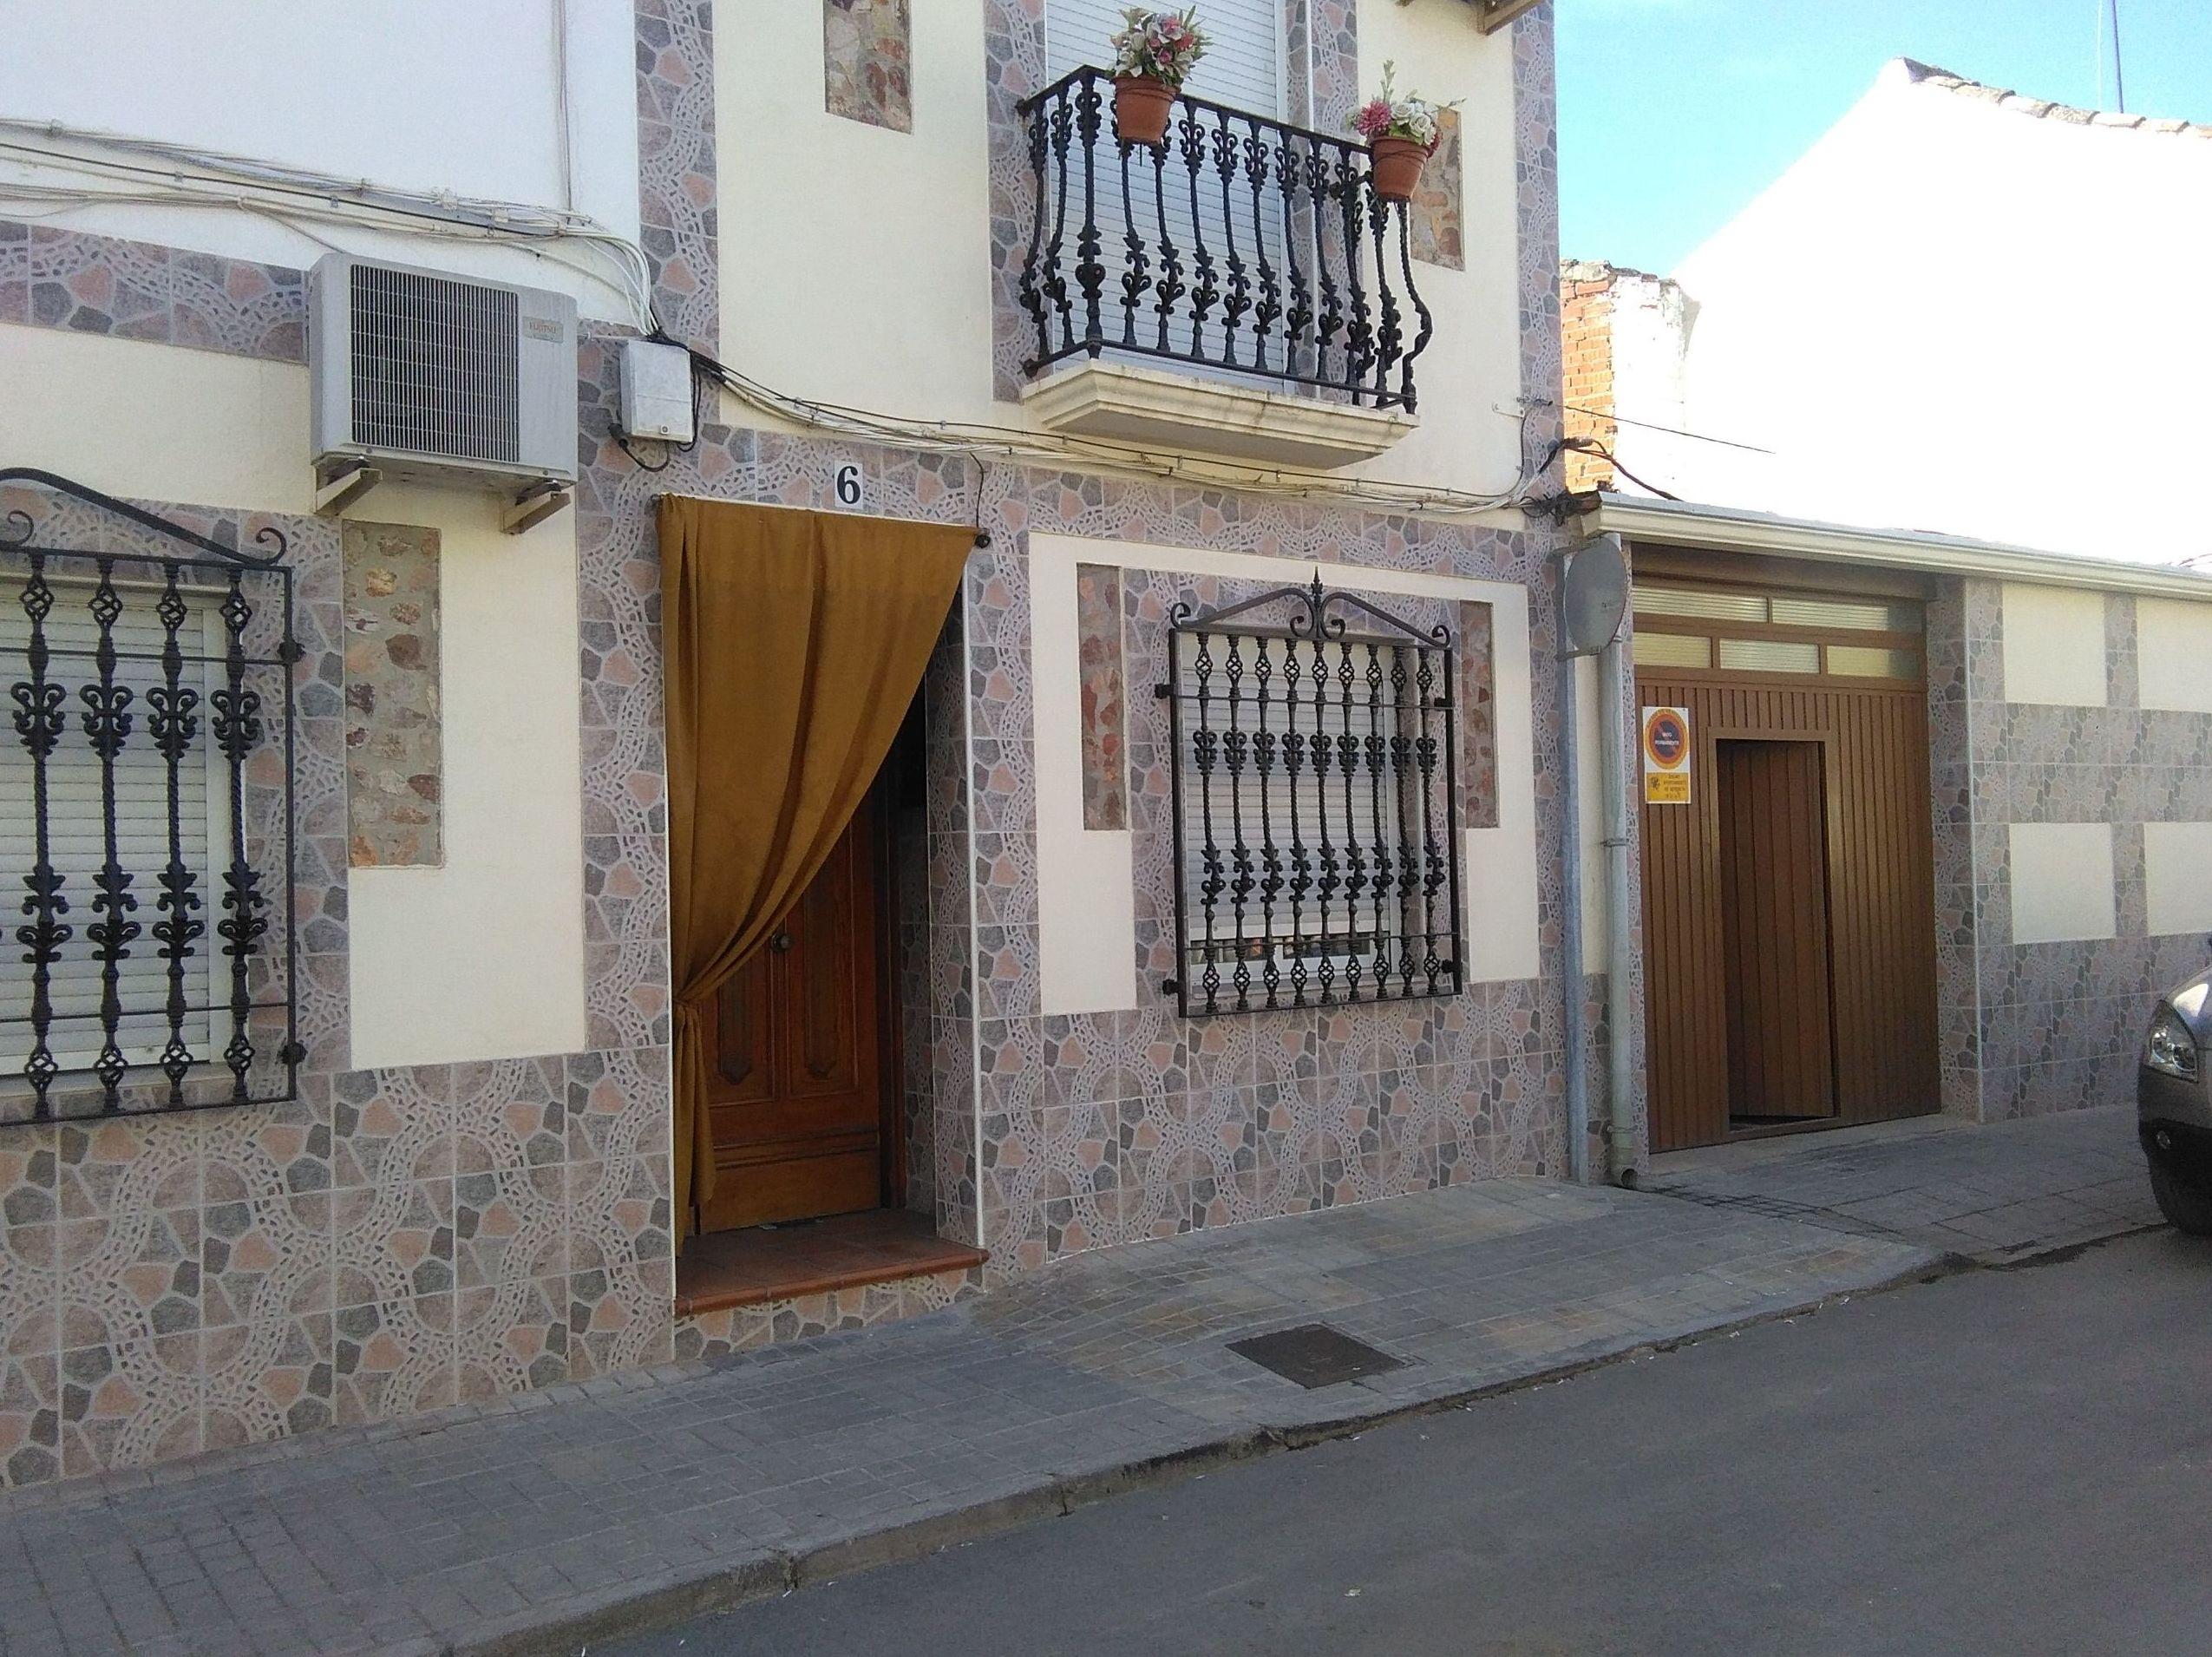 Picture 14 of Inmobiliarias in Herencia | Inmobiliaria Minerva